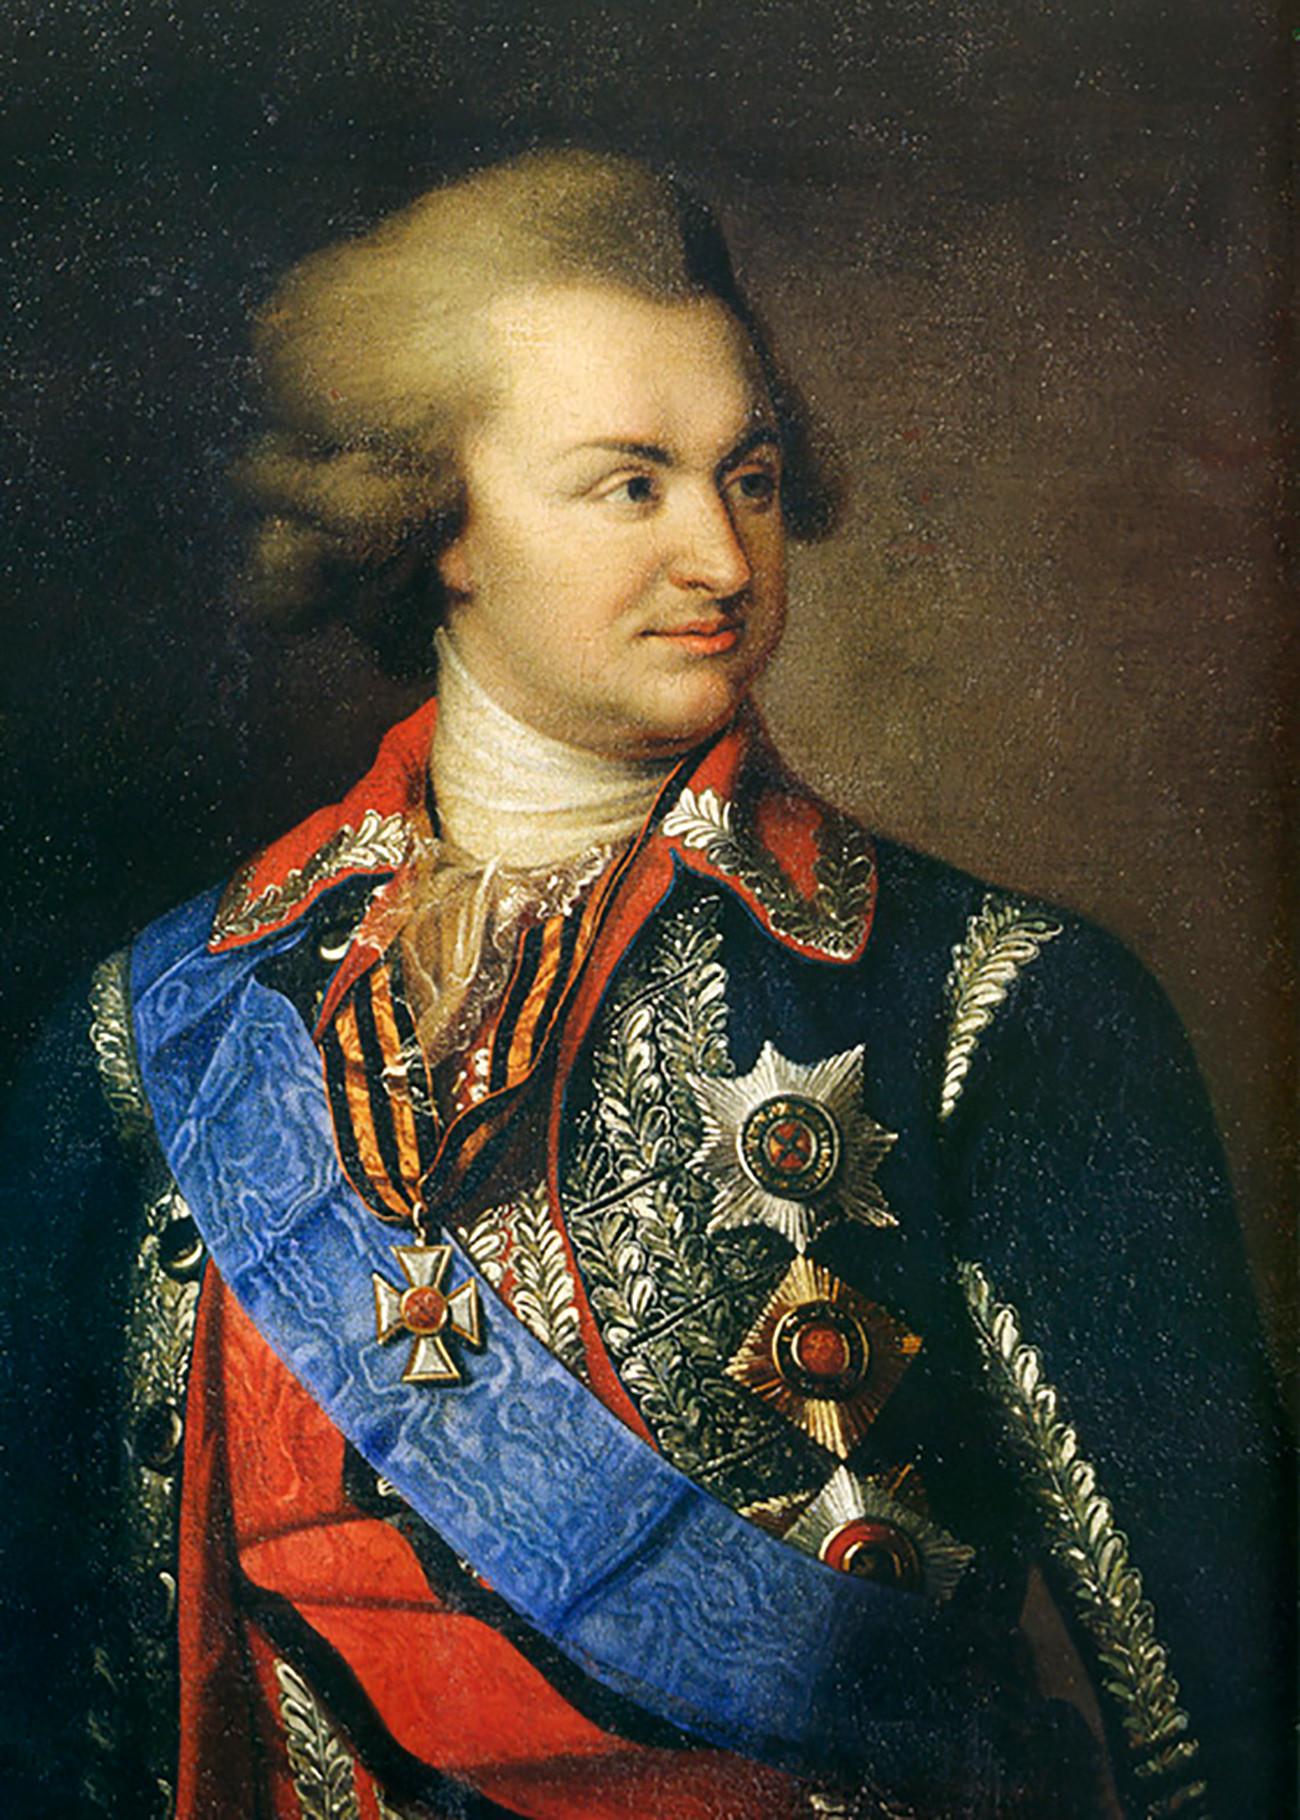 Prince Grigory Aleksandrovich Potemkin-Tauricheski (1739-1791)